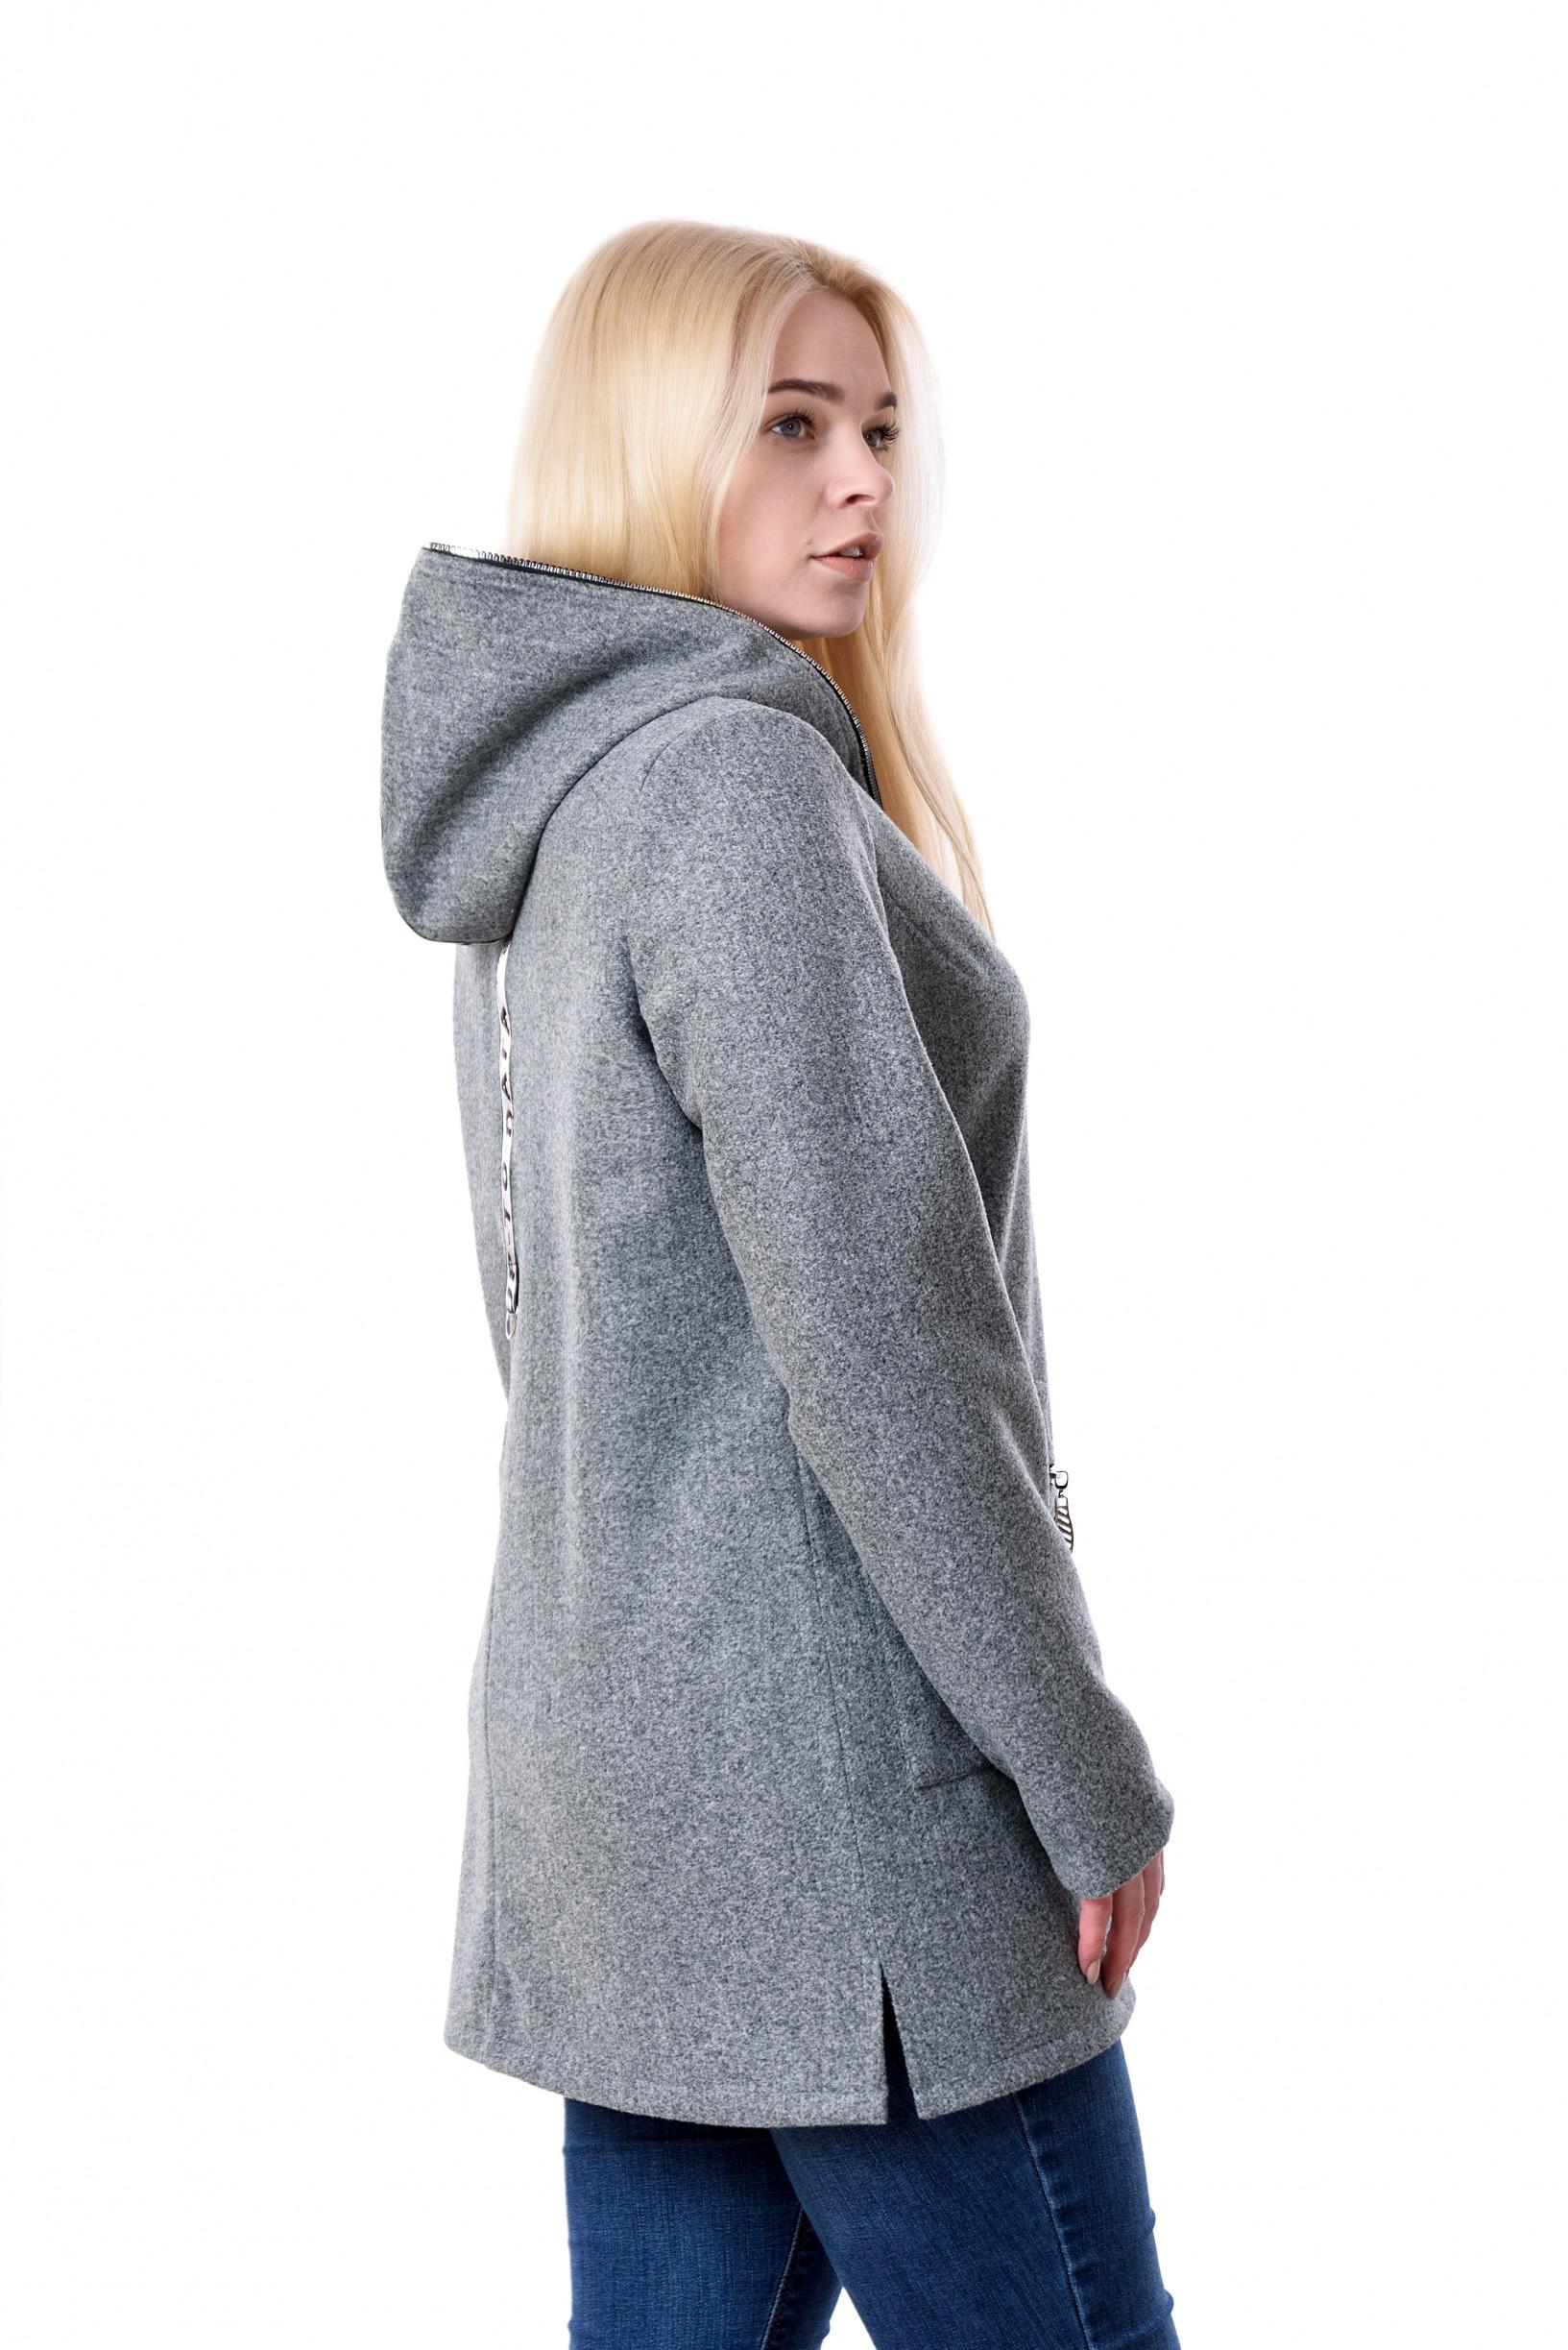 Женский весениий серый кардиган Мерил